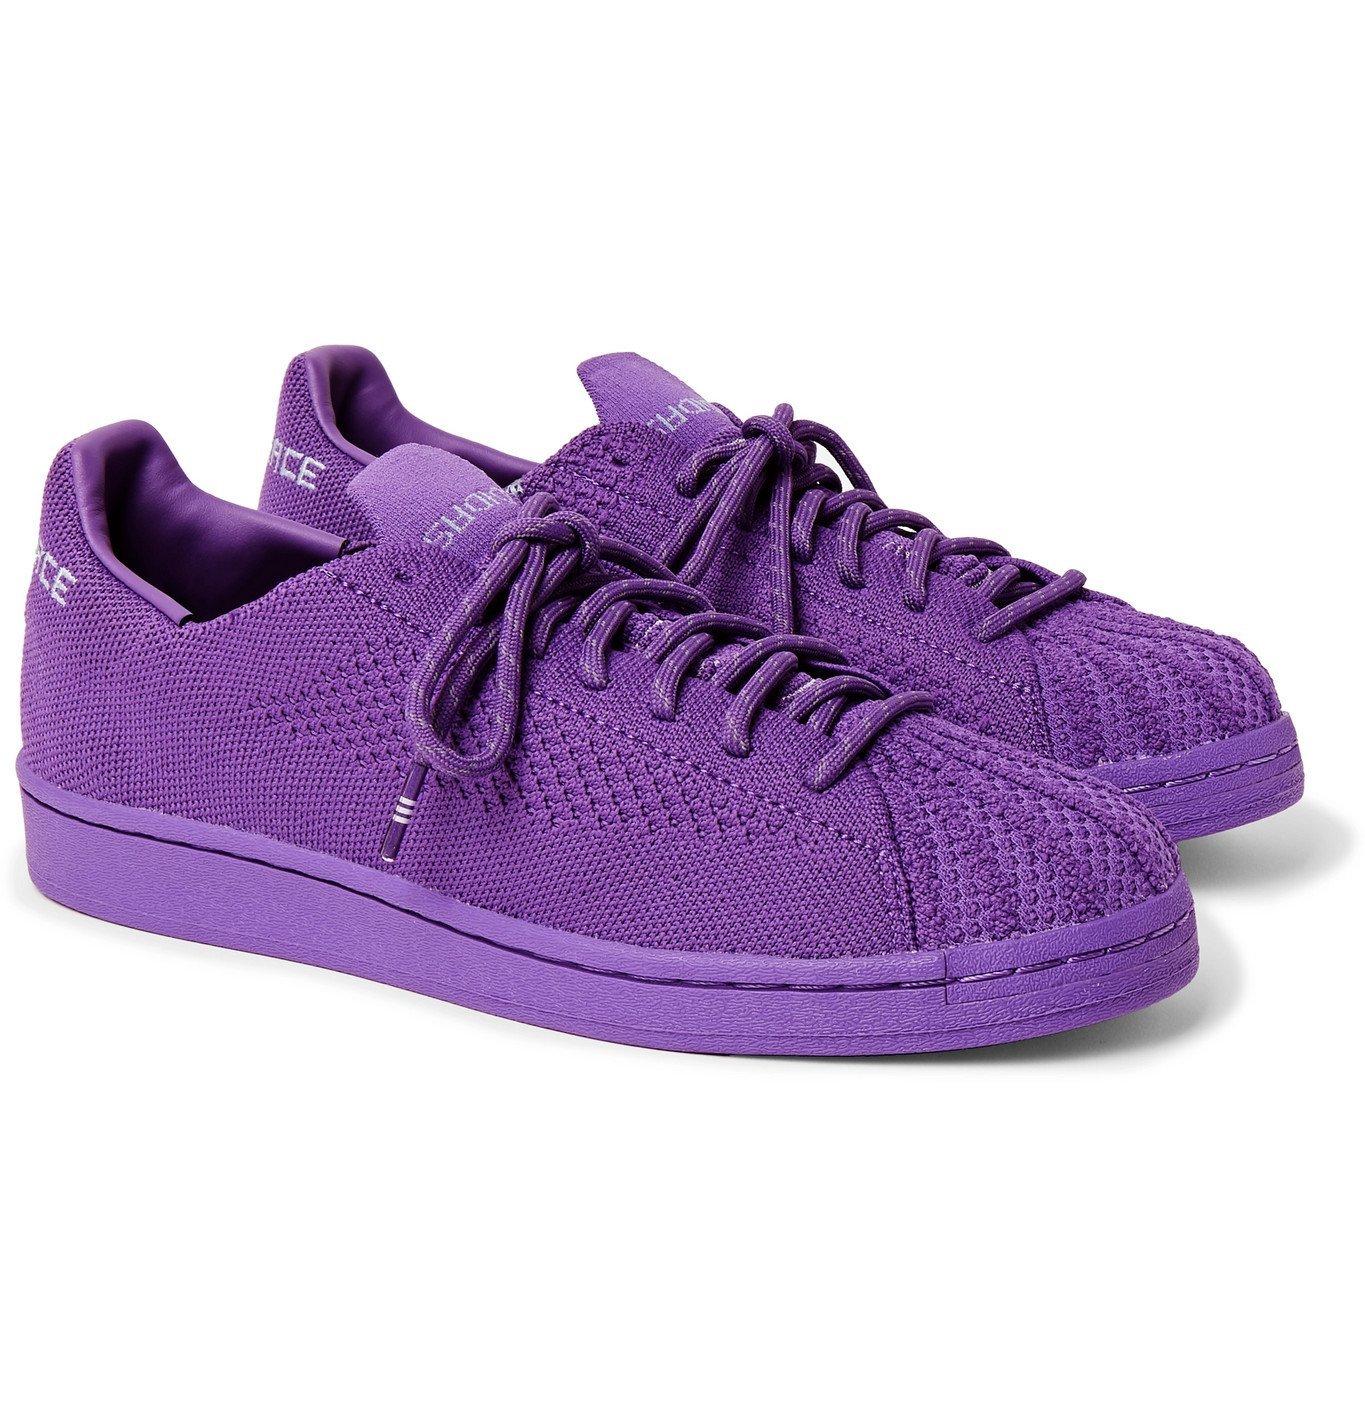 ADIDAS ORIGINALS - Pharrell Williams Superstar Embroidered Primeknit Sneakers - Purple